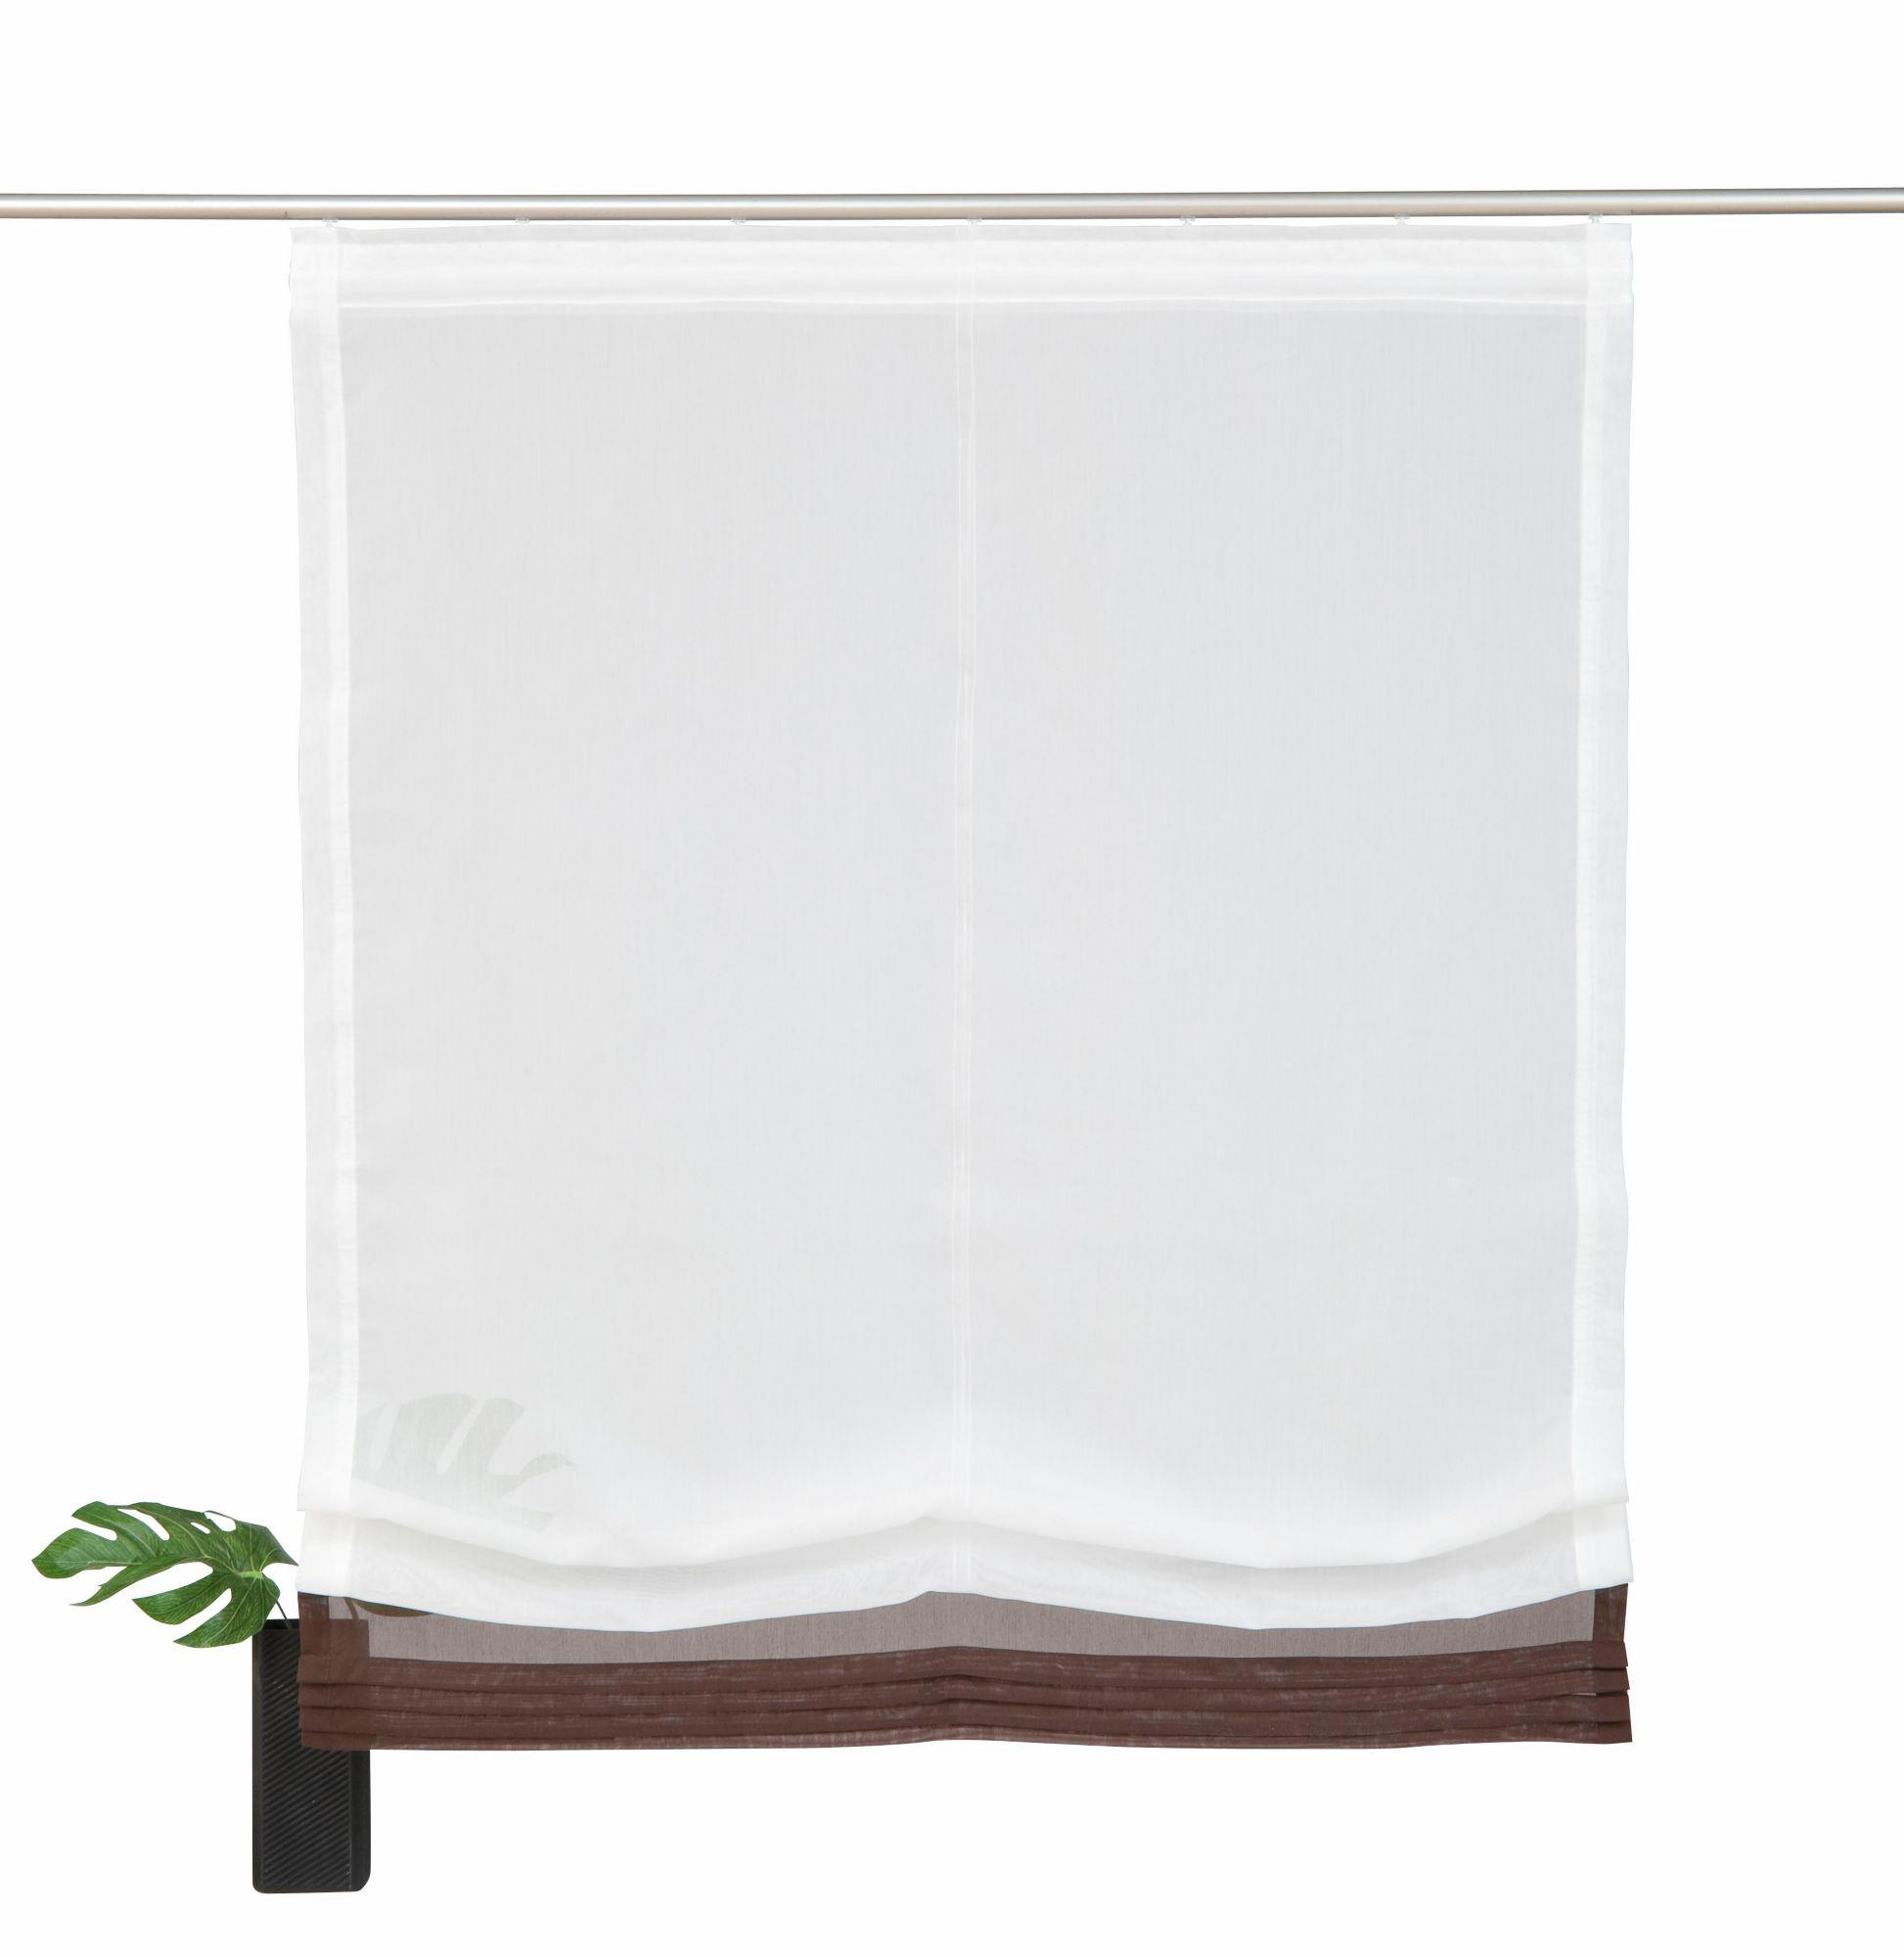 raffrollo home affaire collection gander mit. Black Bedroom Furniture Sets. Home Design Ideas